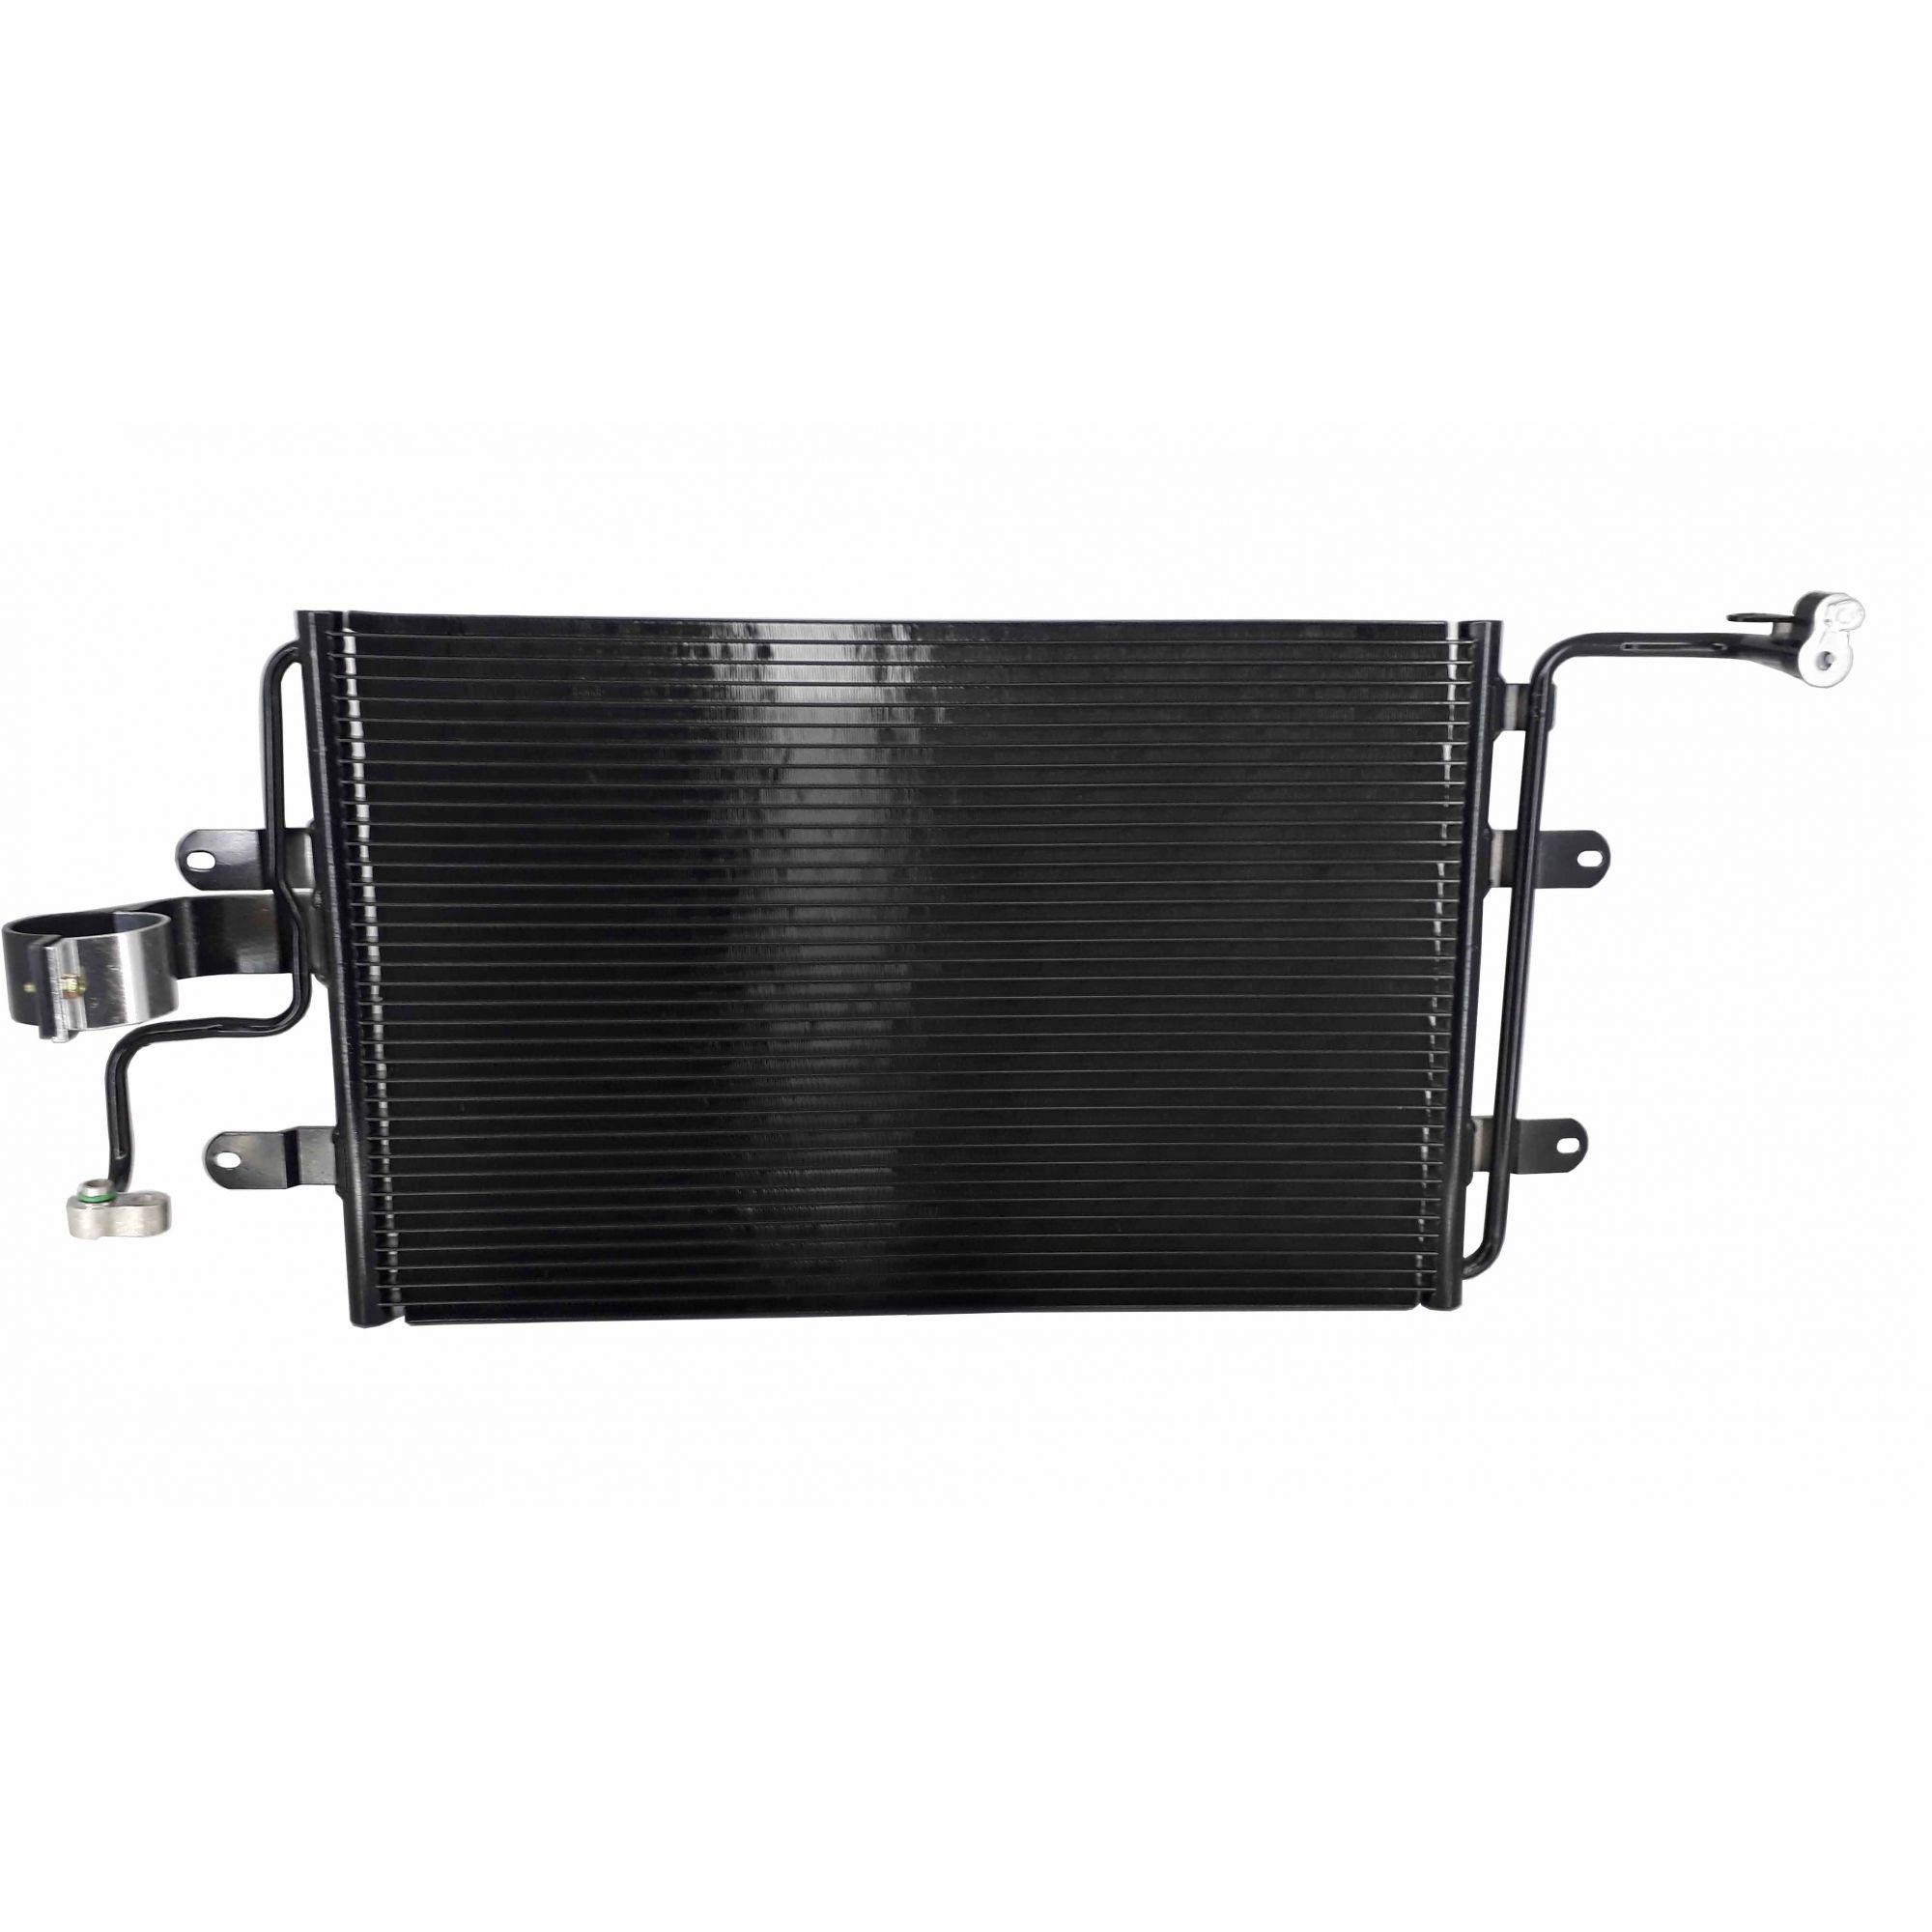 Condensador Audi A3 / Vw Bora / Golf